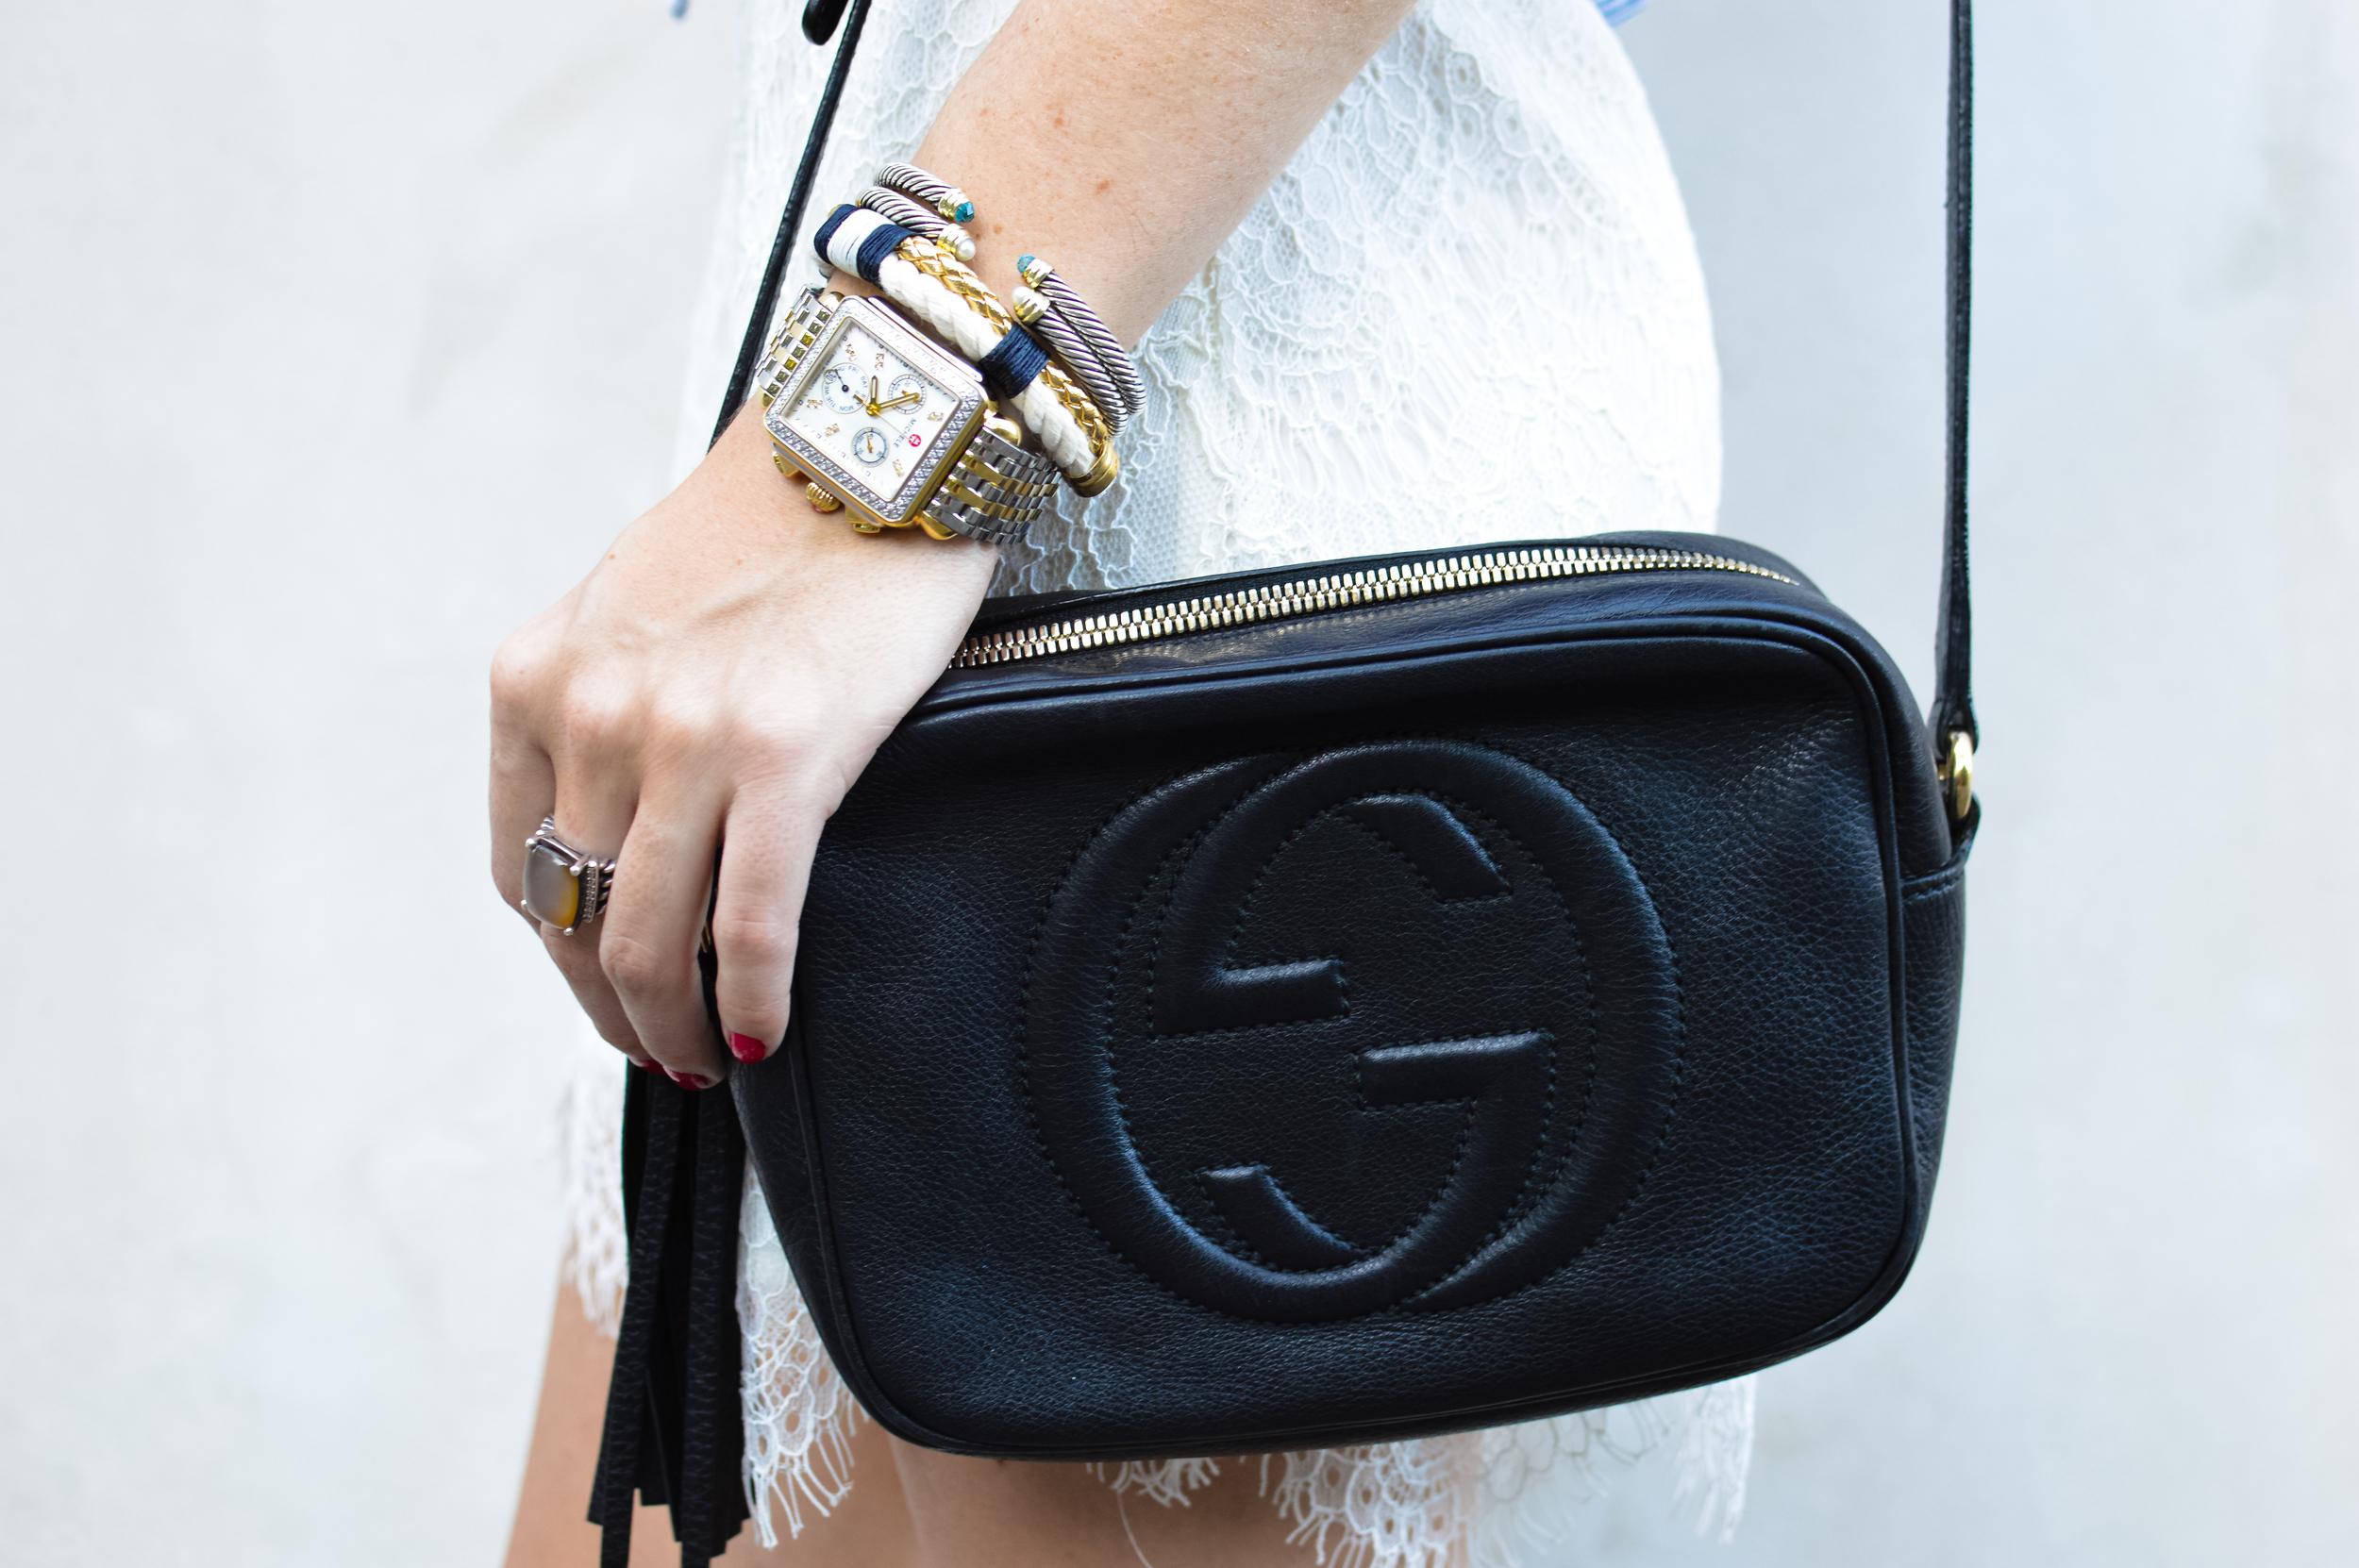 lcb_style_fashion_blogger_fourth of july (14 of 16).jpg